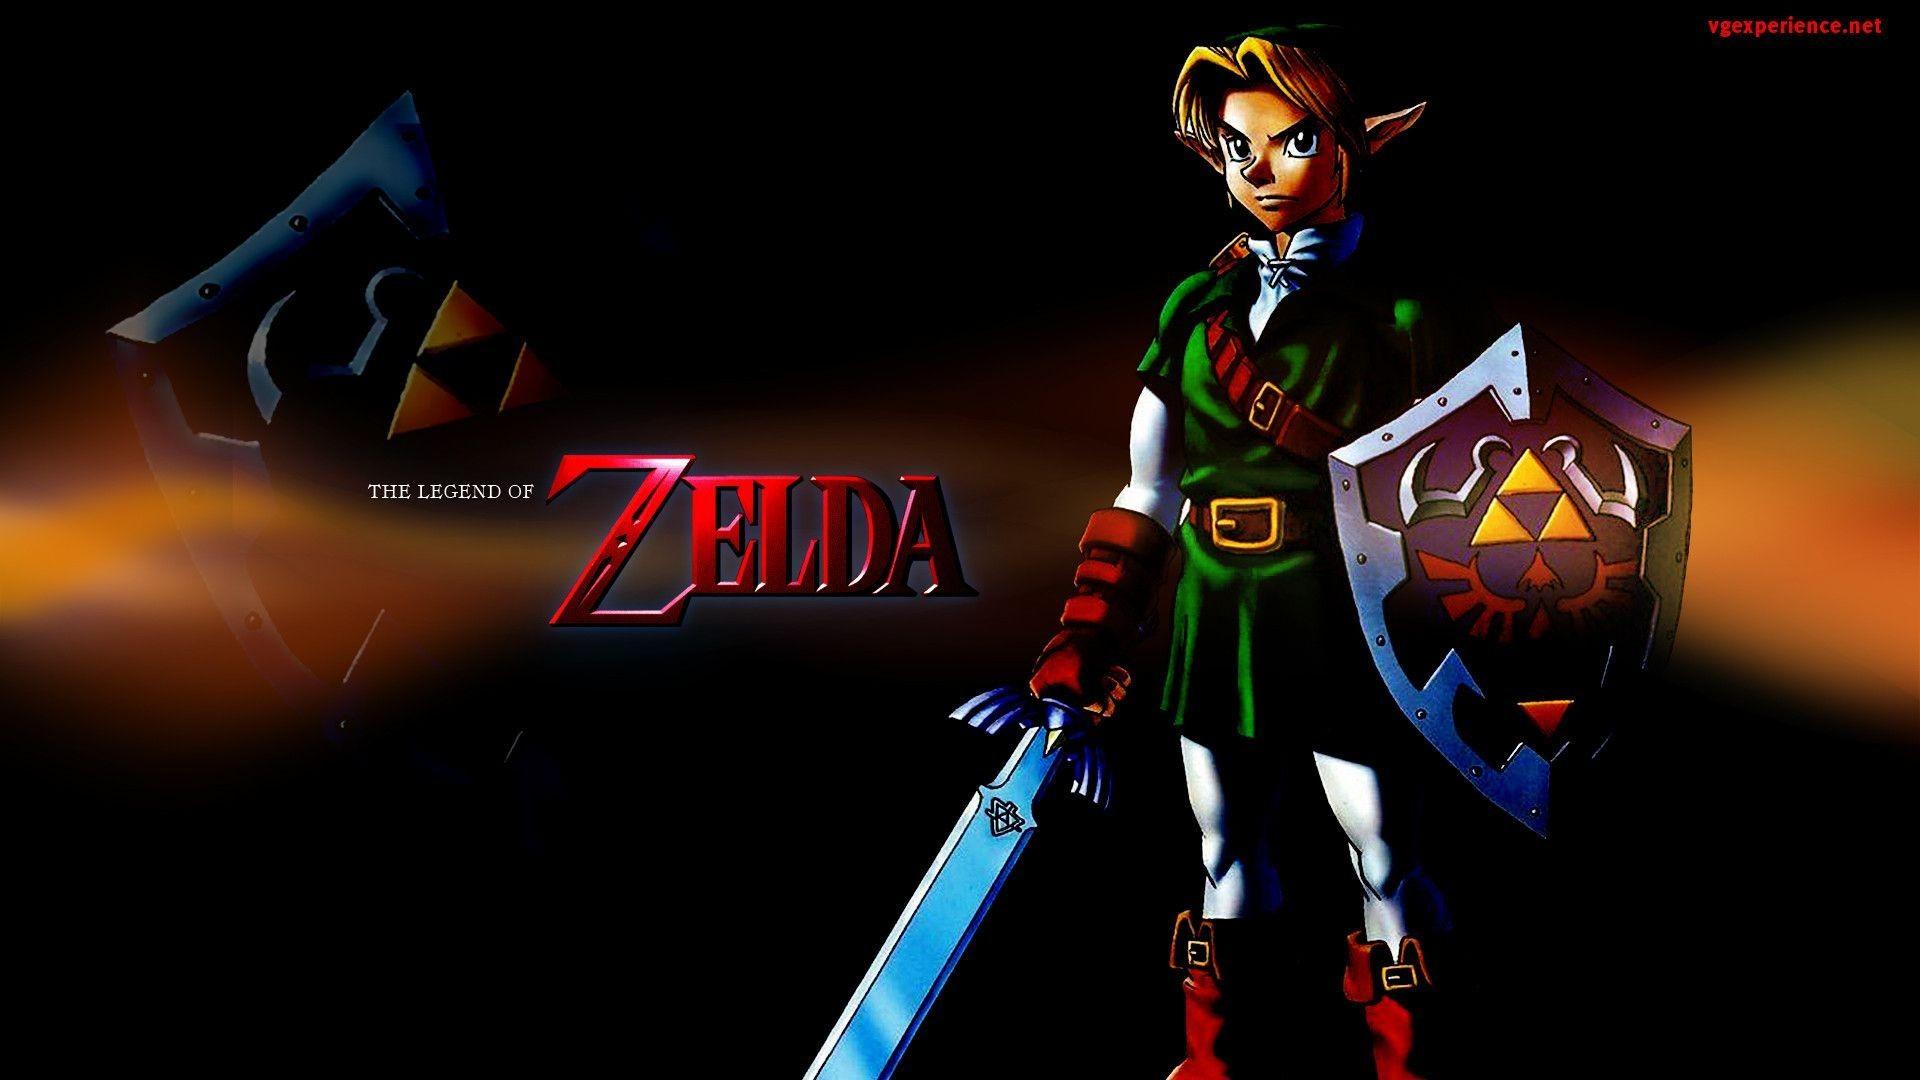 The Legend Of Zelda HD desktop wallpaper High Definition | HD Wallpapers |  Pinterest | Mobile wallpaper, Hd wallpaper and Wallpaper